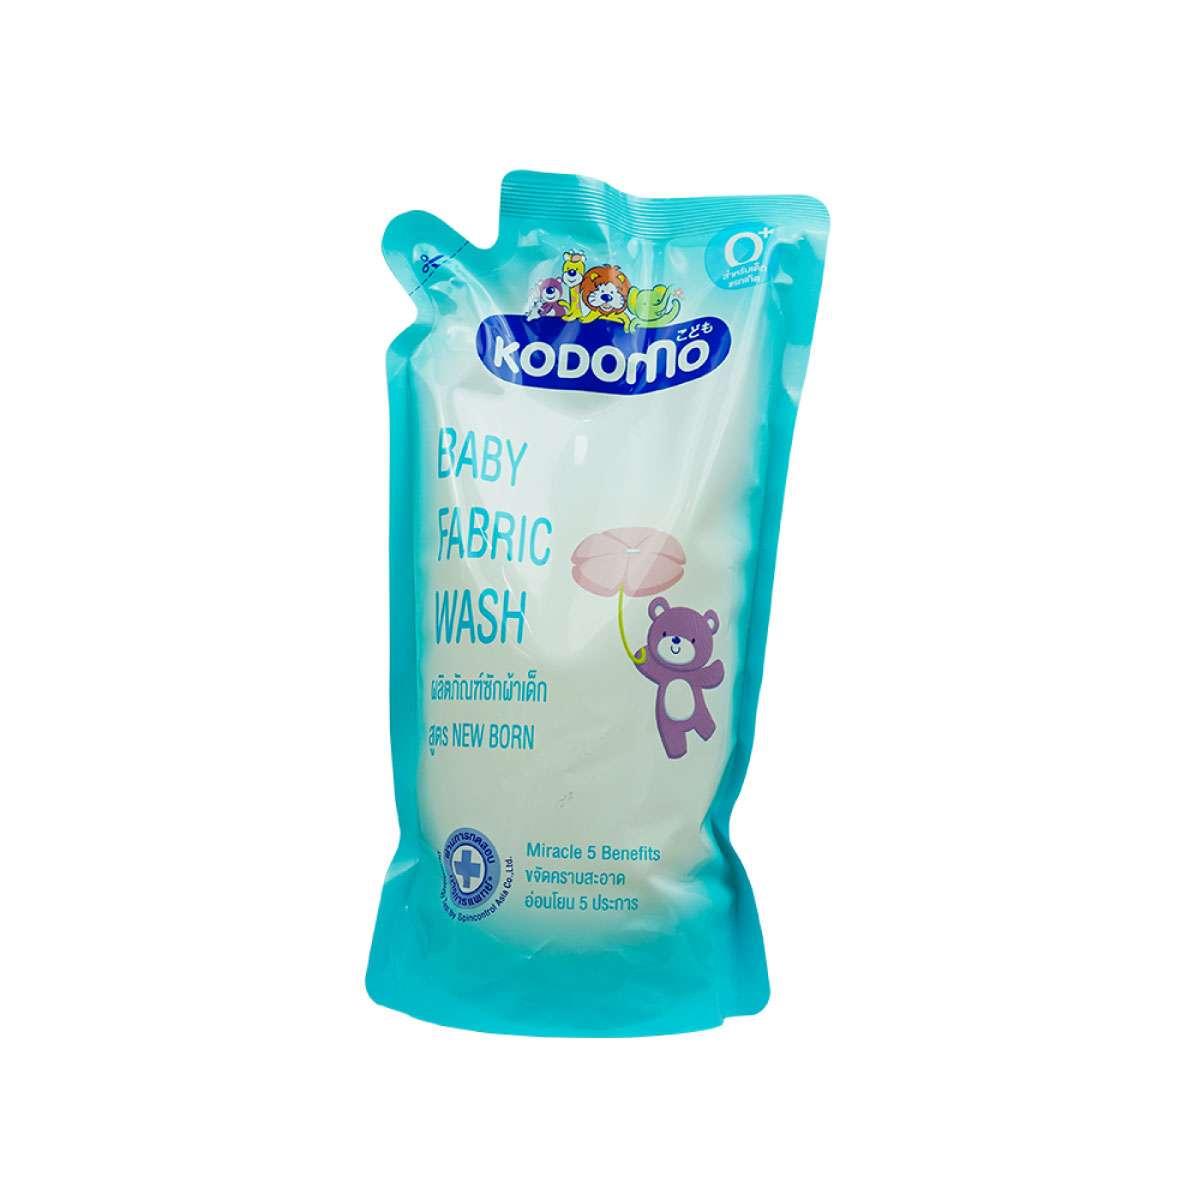 KODOMO Baby Fabric Wash Refill